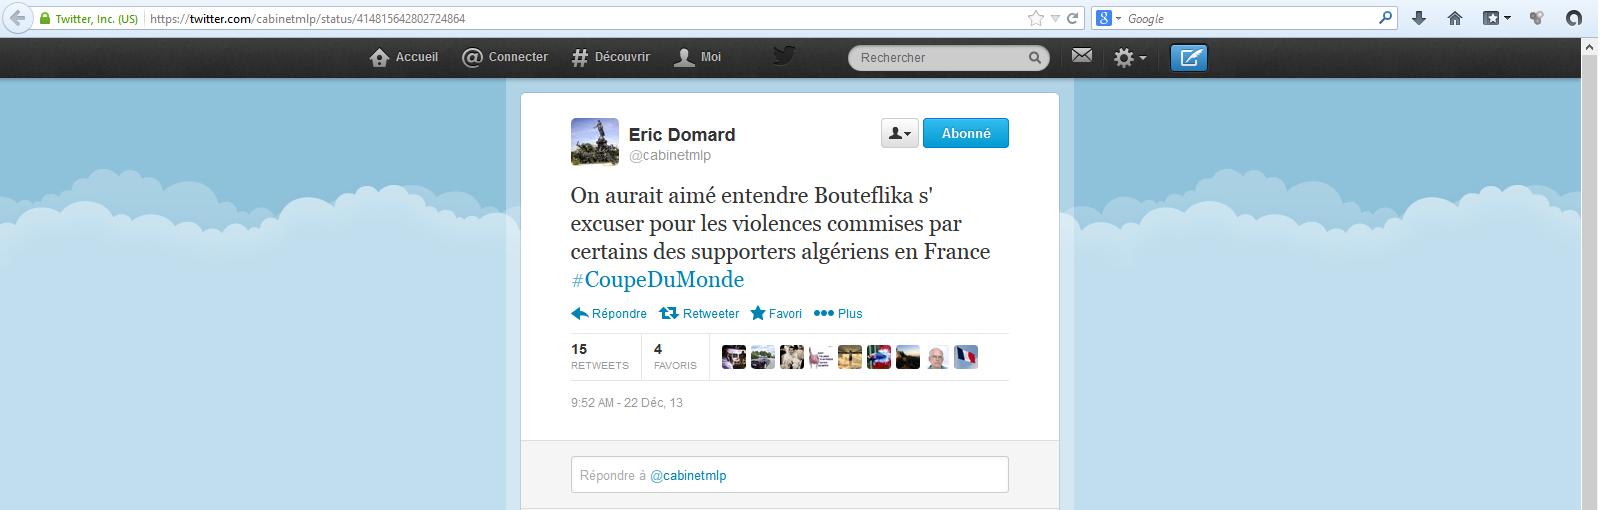 Eric-Domard-22-12-13-Bouteflika-et-supporters-algeriens